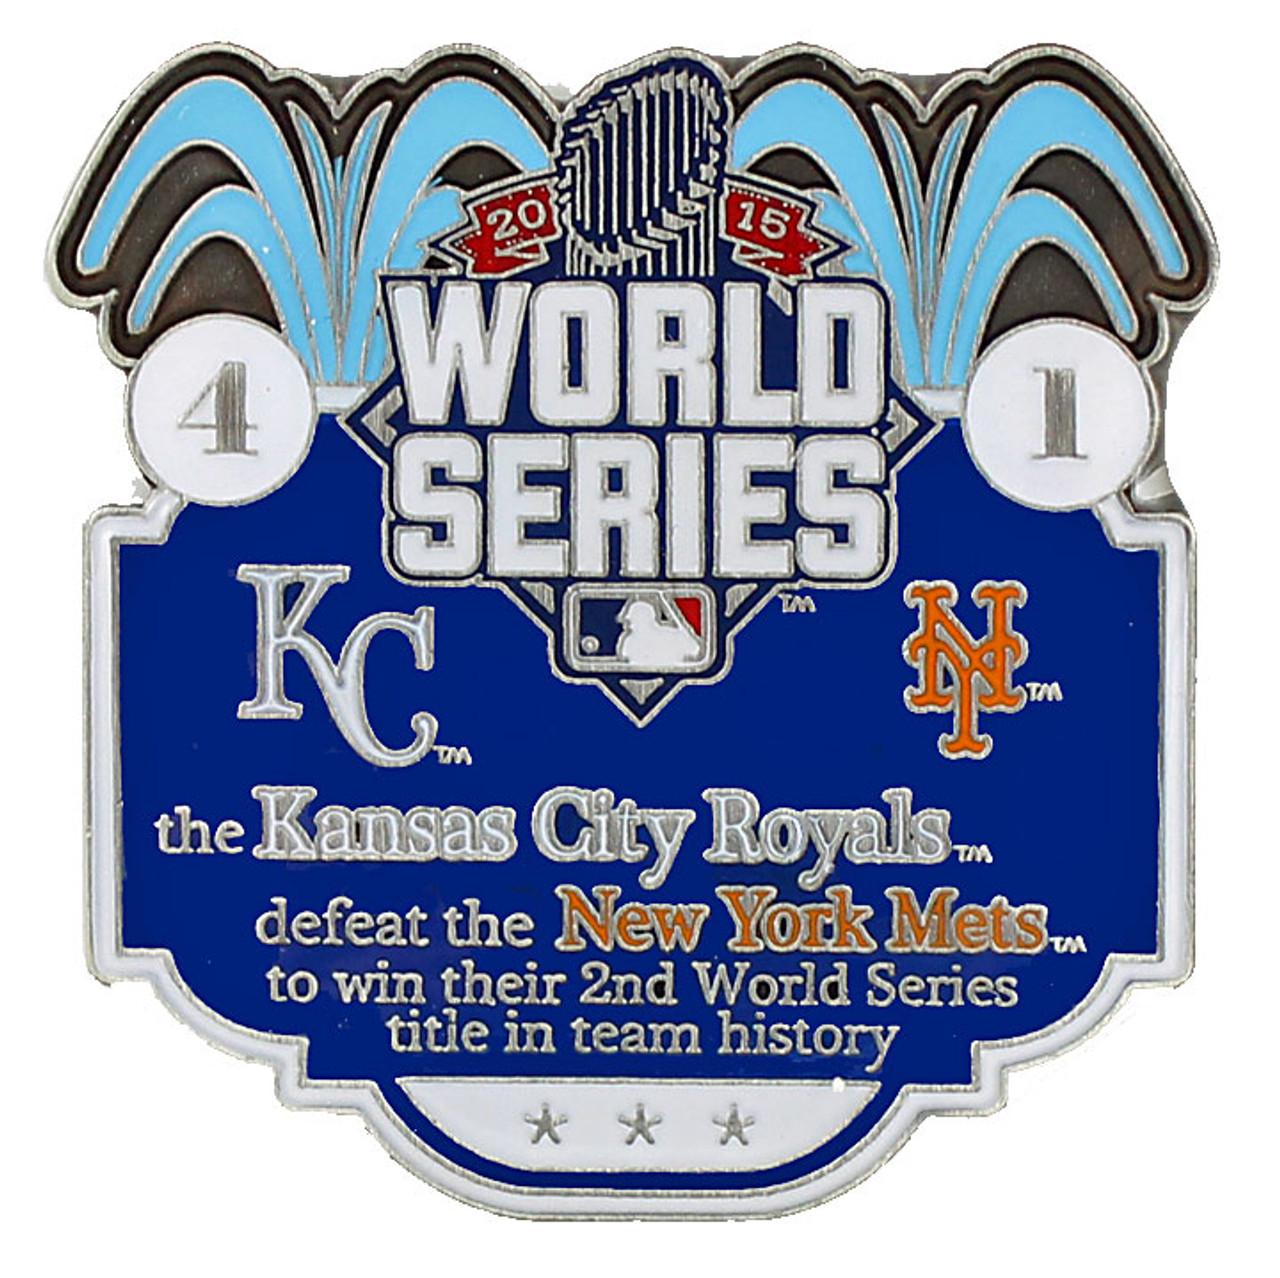 2015 World Series Commemorative Pin - Royals vs  Mets